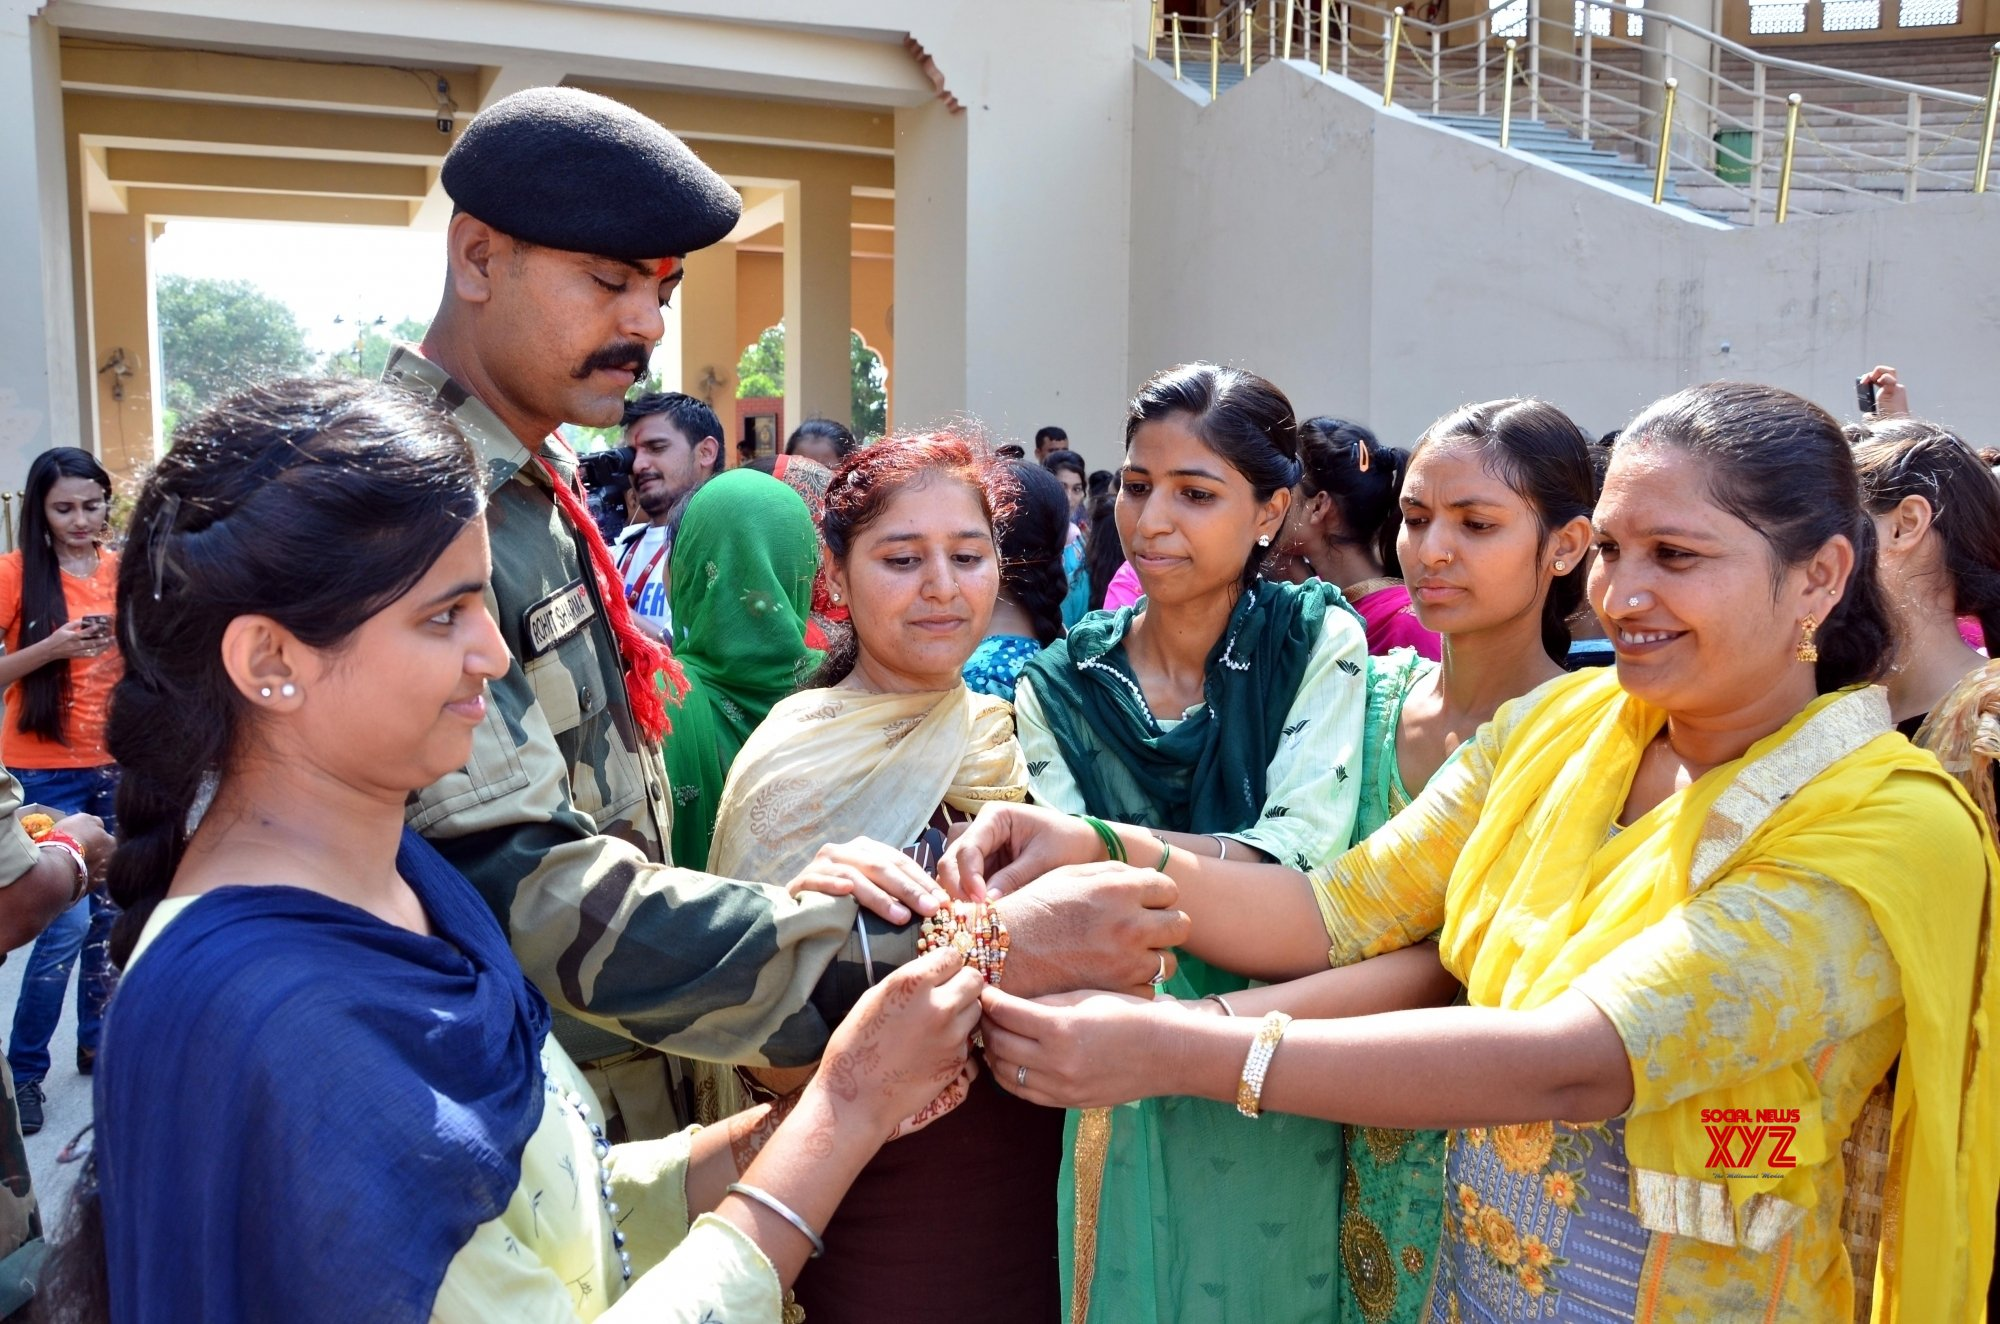 Attari (Punjab): Raksha Bandhan celebrations at Attari - Wagah border #Gallery